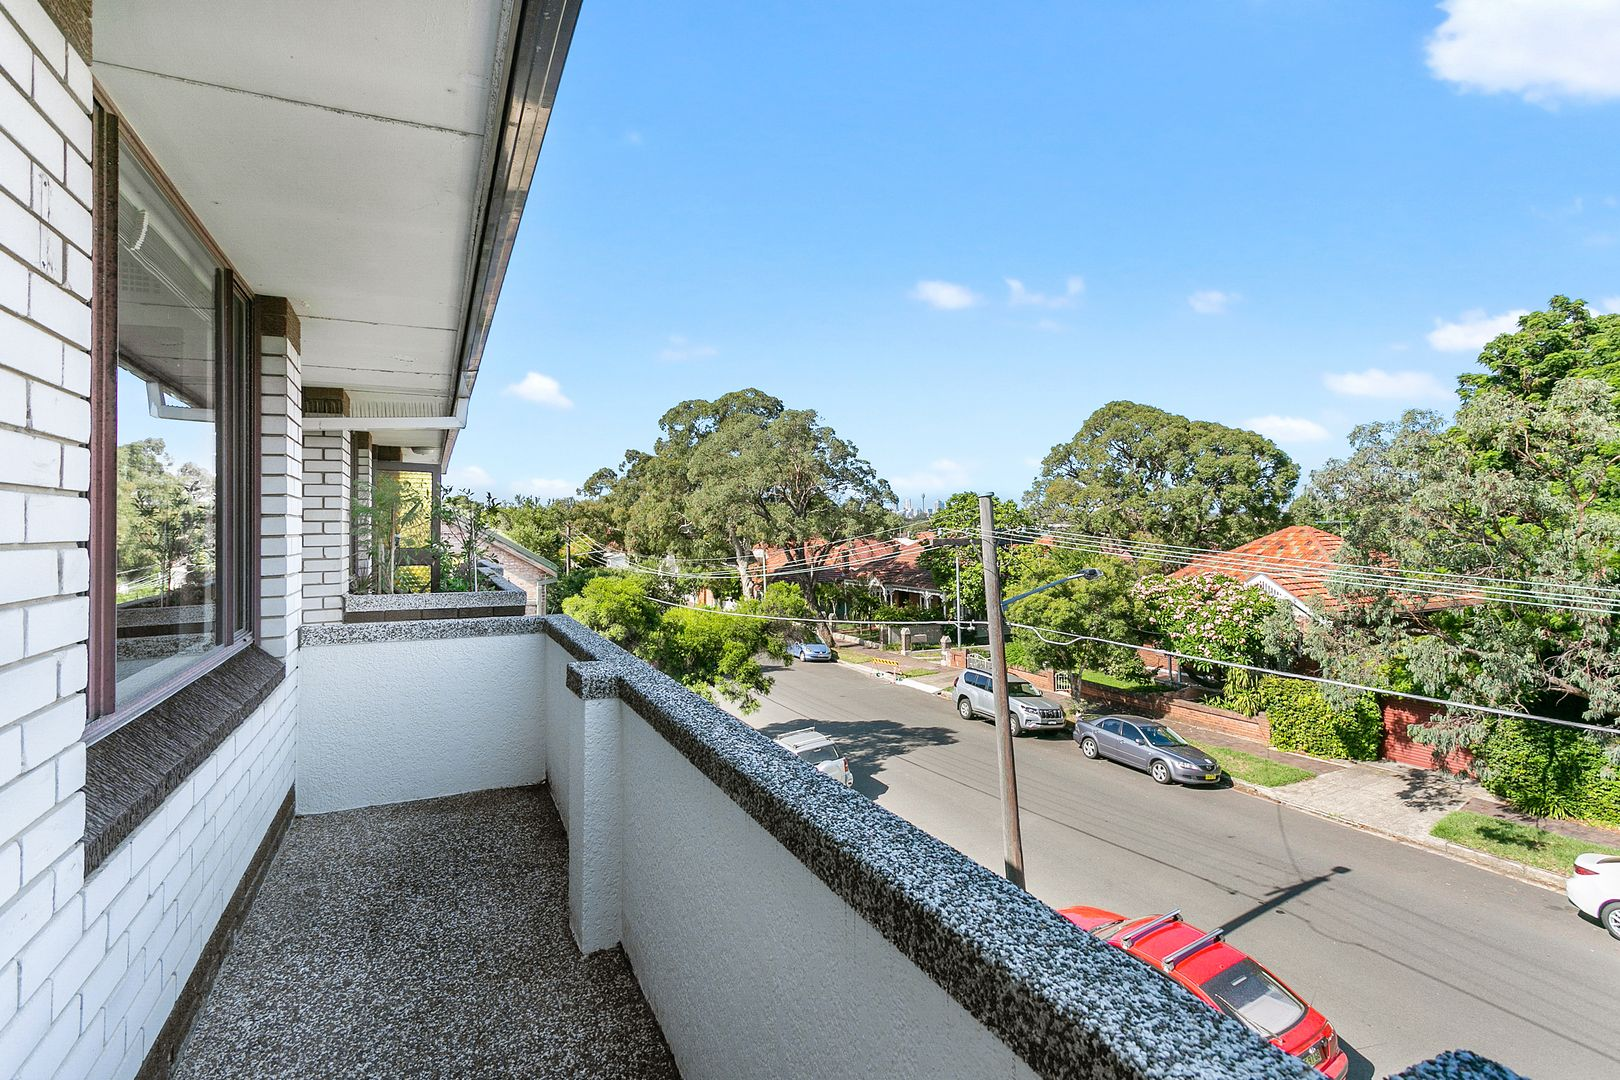 7/339 Marrickville Road, Marrickville NSW 2204, Image 0